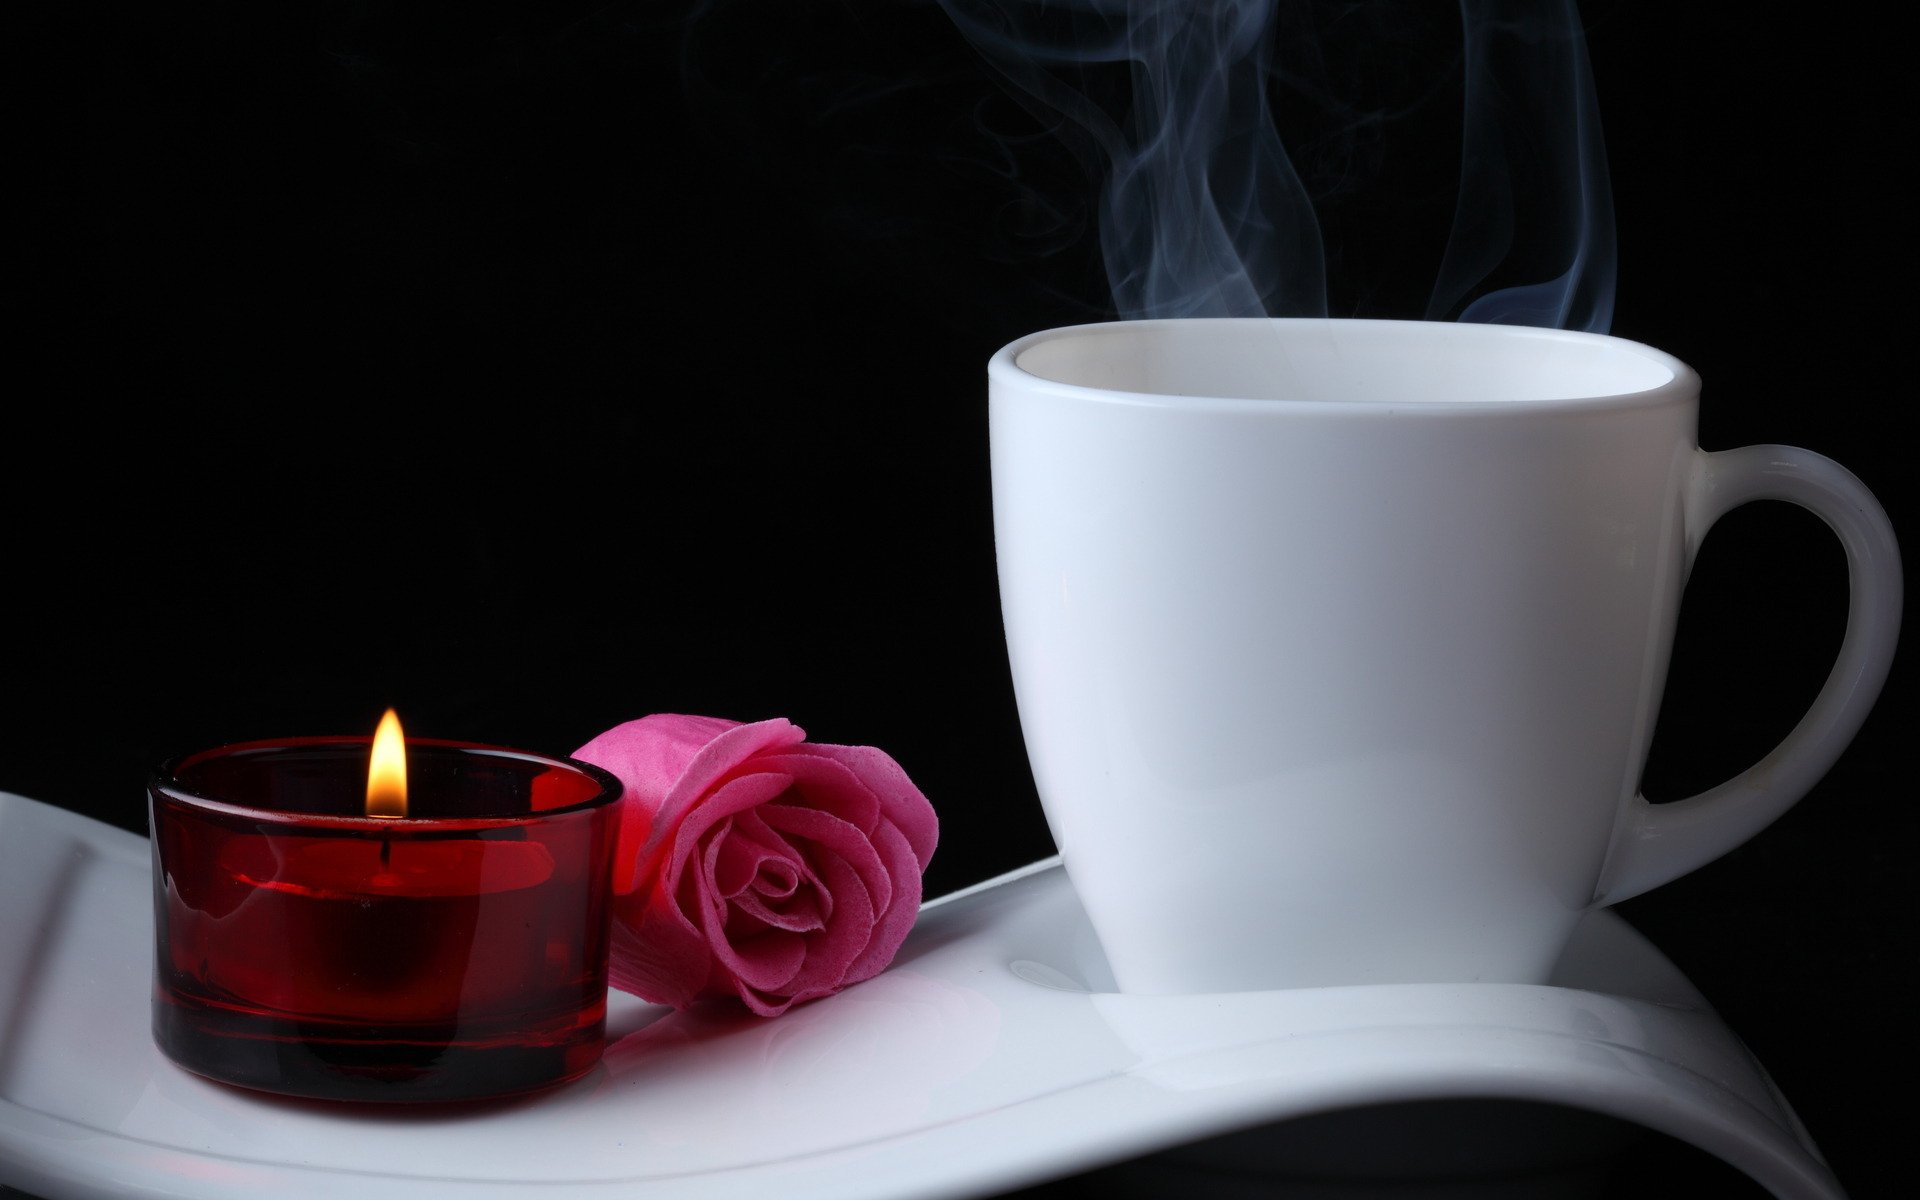 Фото чашка кофе на столе с розой